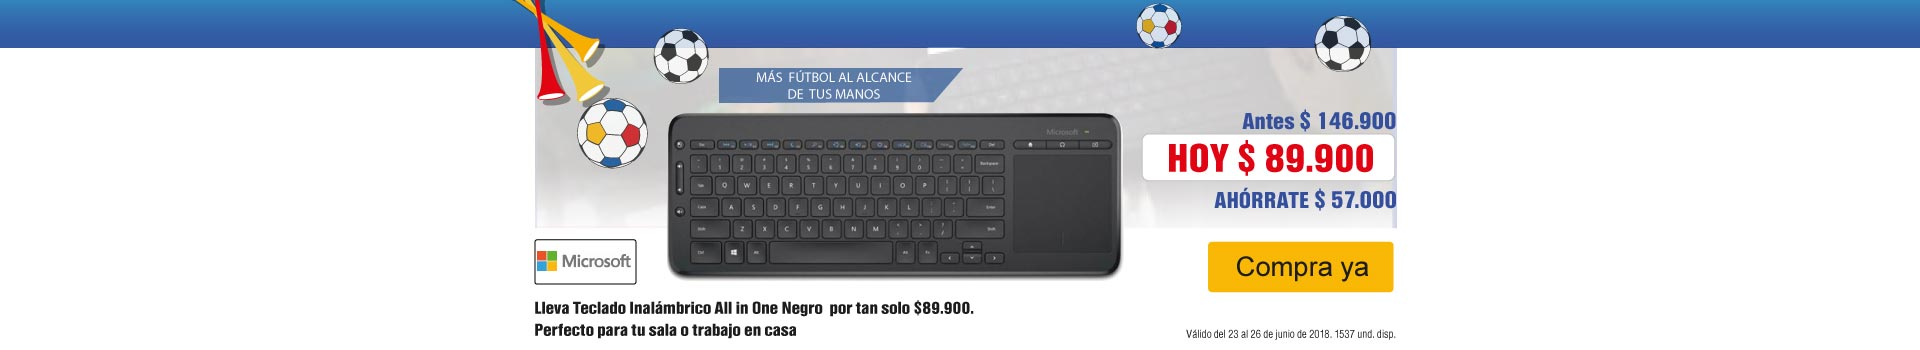 AK-KT-BCAT-7-accesorios-PP---Microsoft-teclado-Jun23